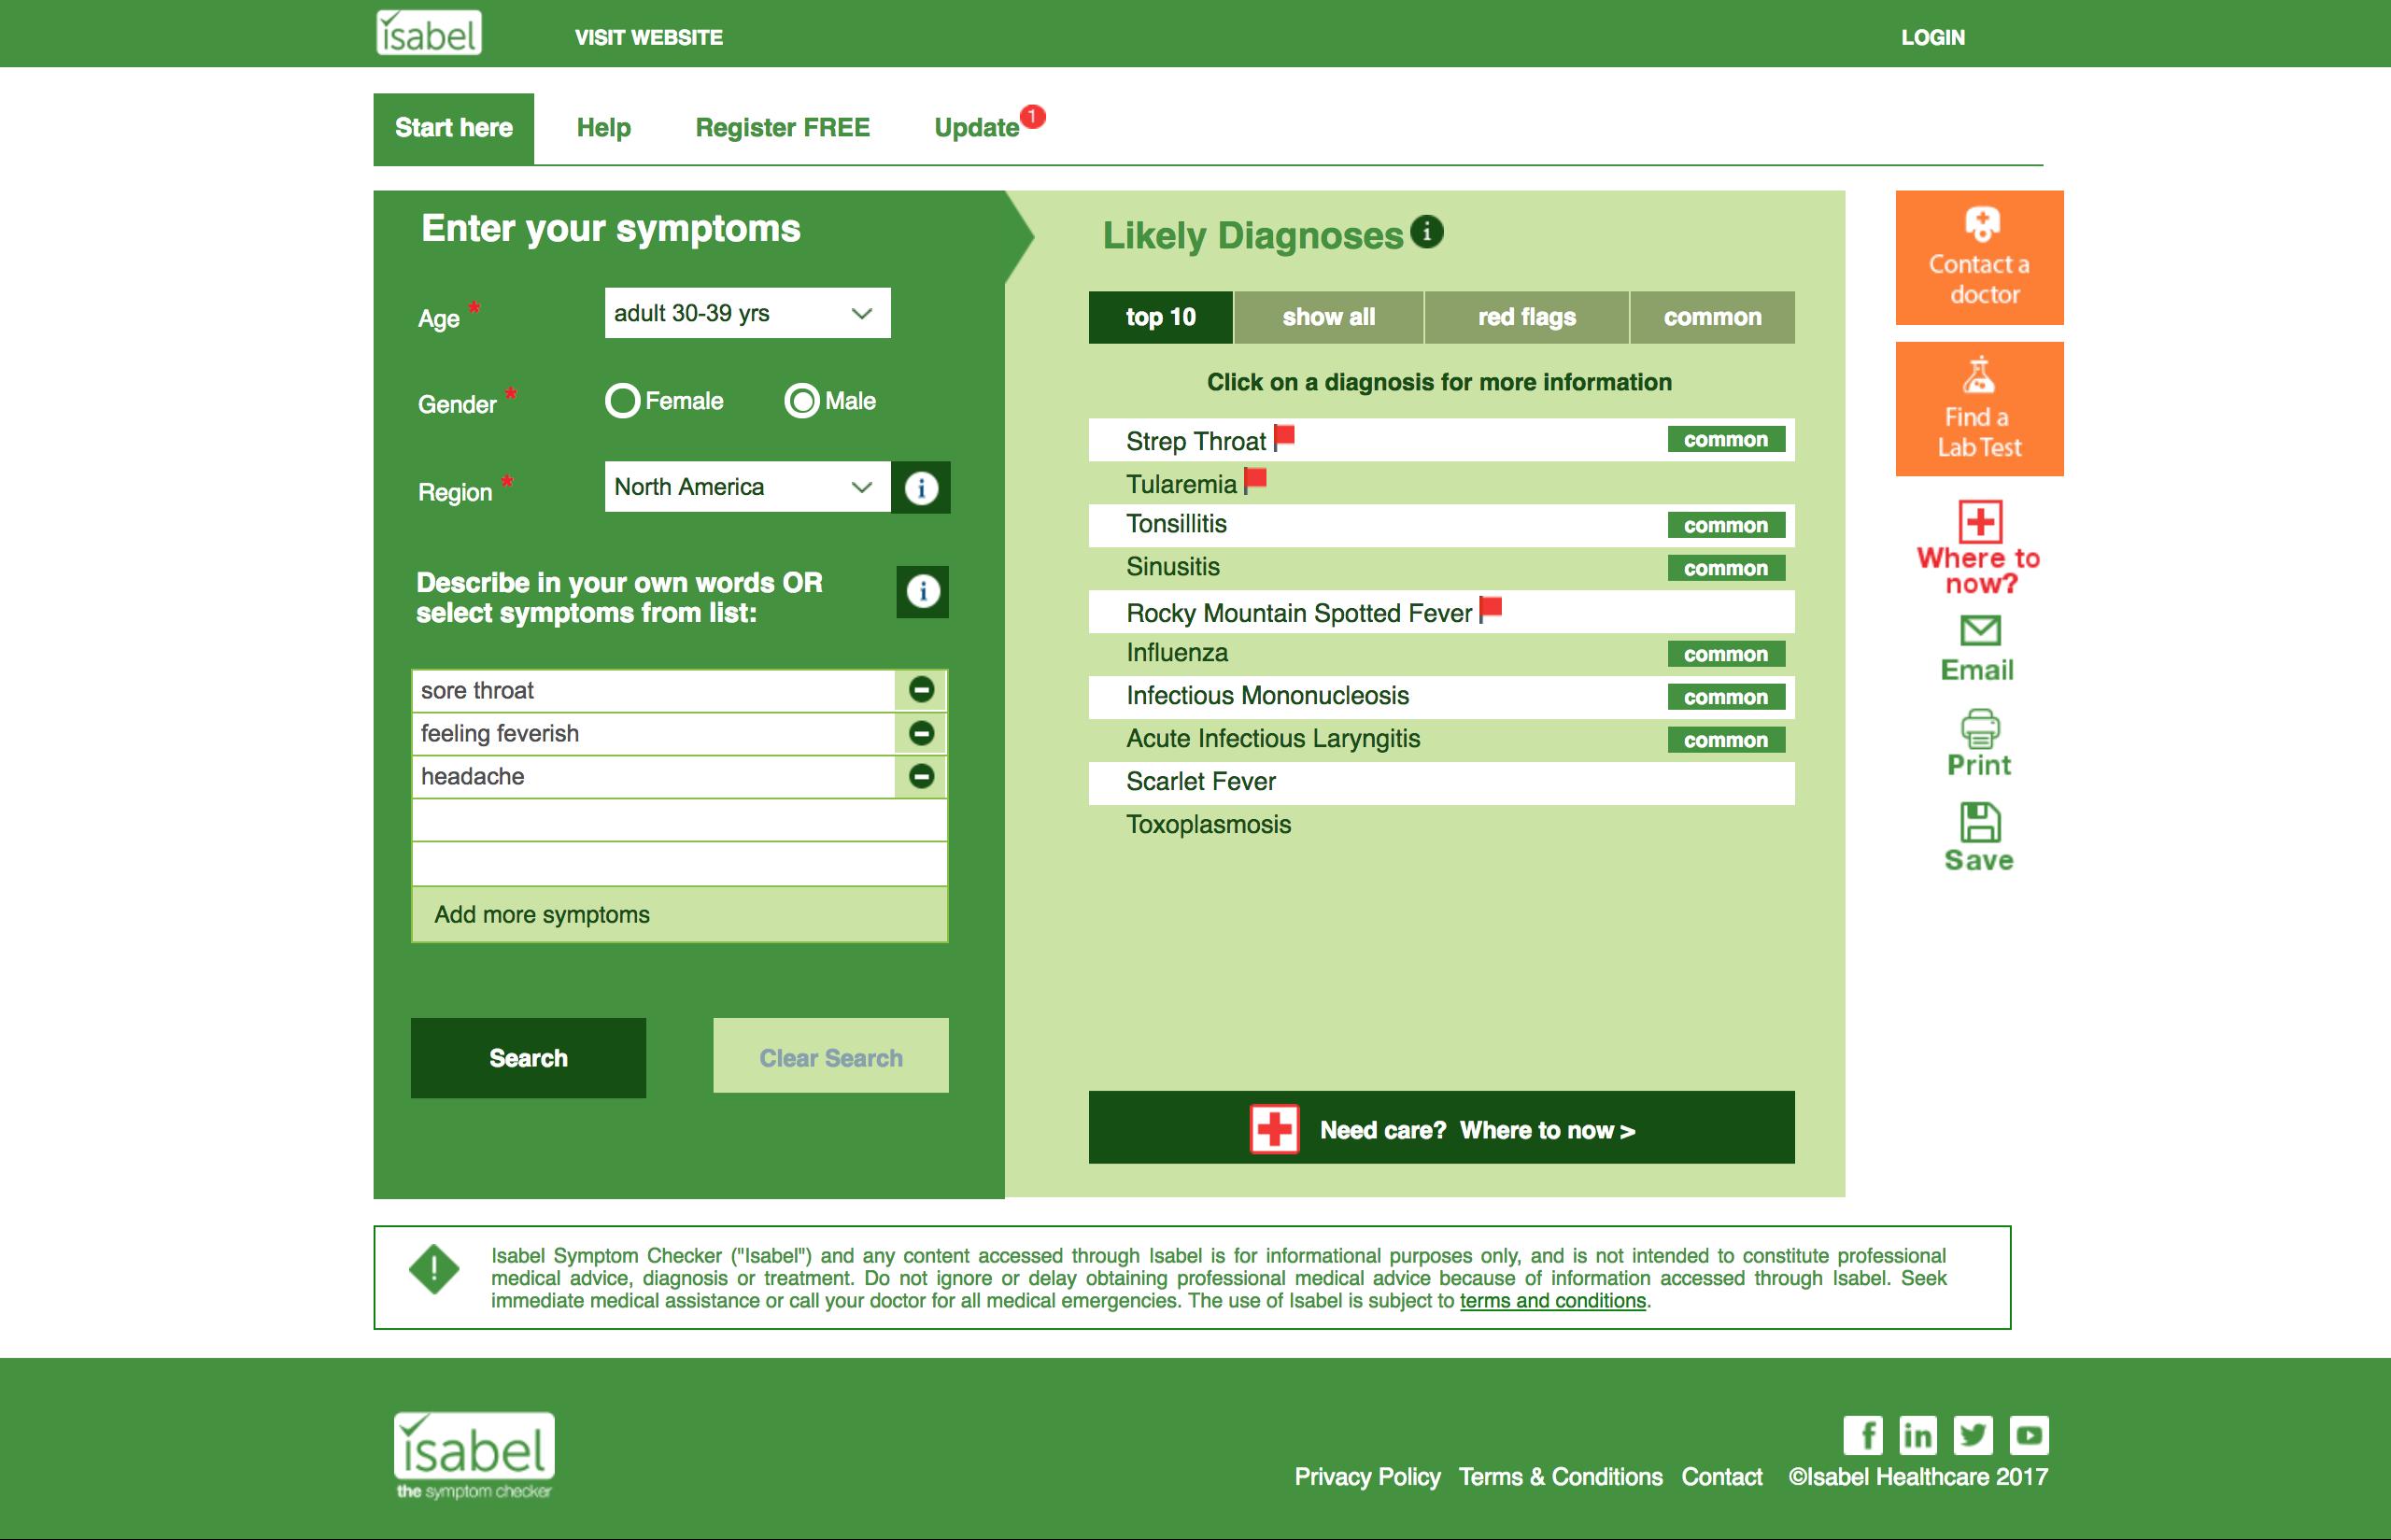 screencapture-symptomchecker-isabelhealthcare-private-suggest_diagnosis-jsp-1506514314440.png